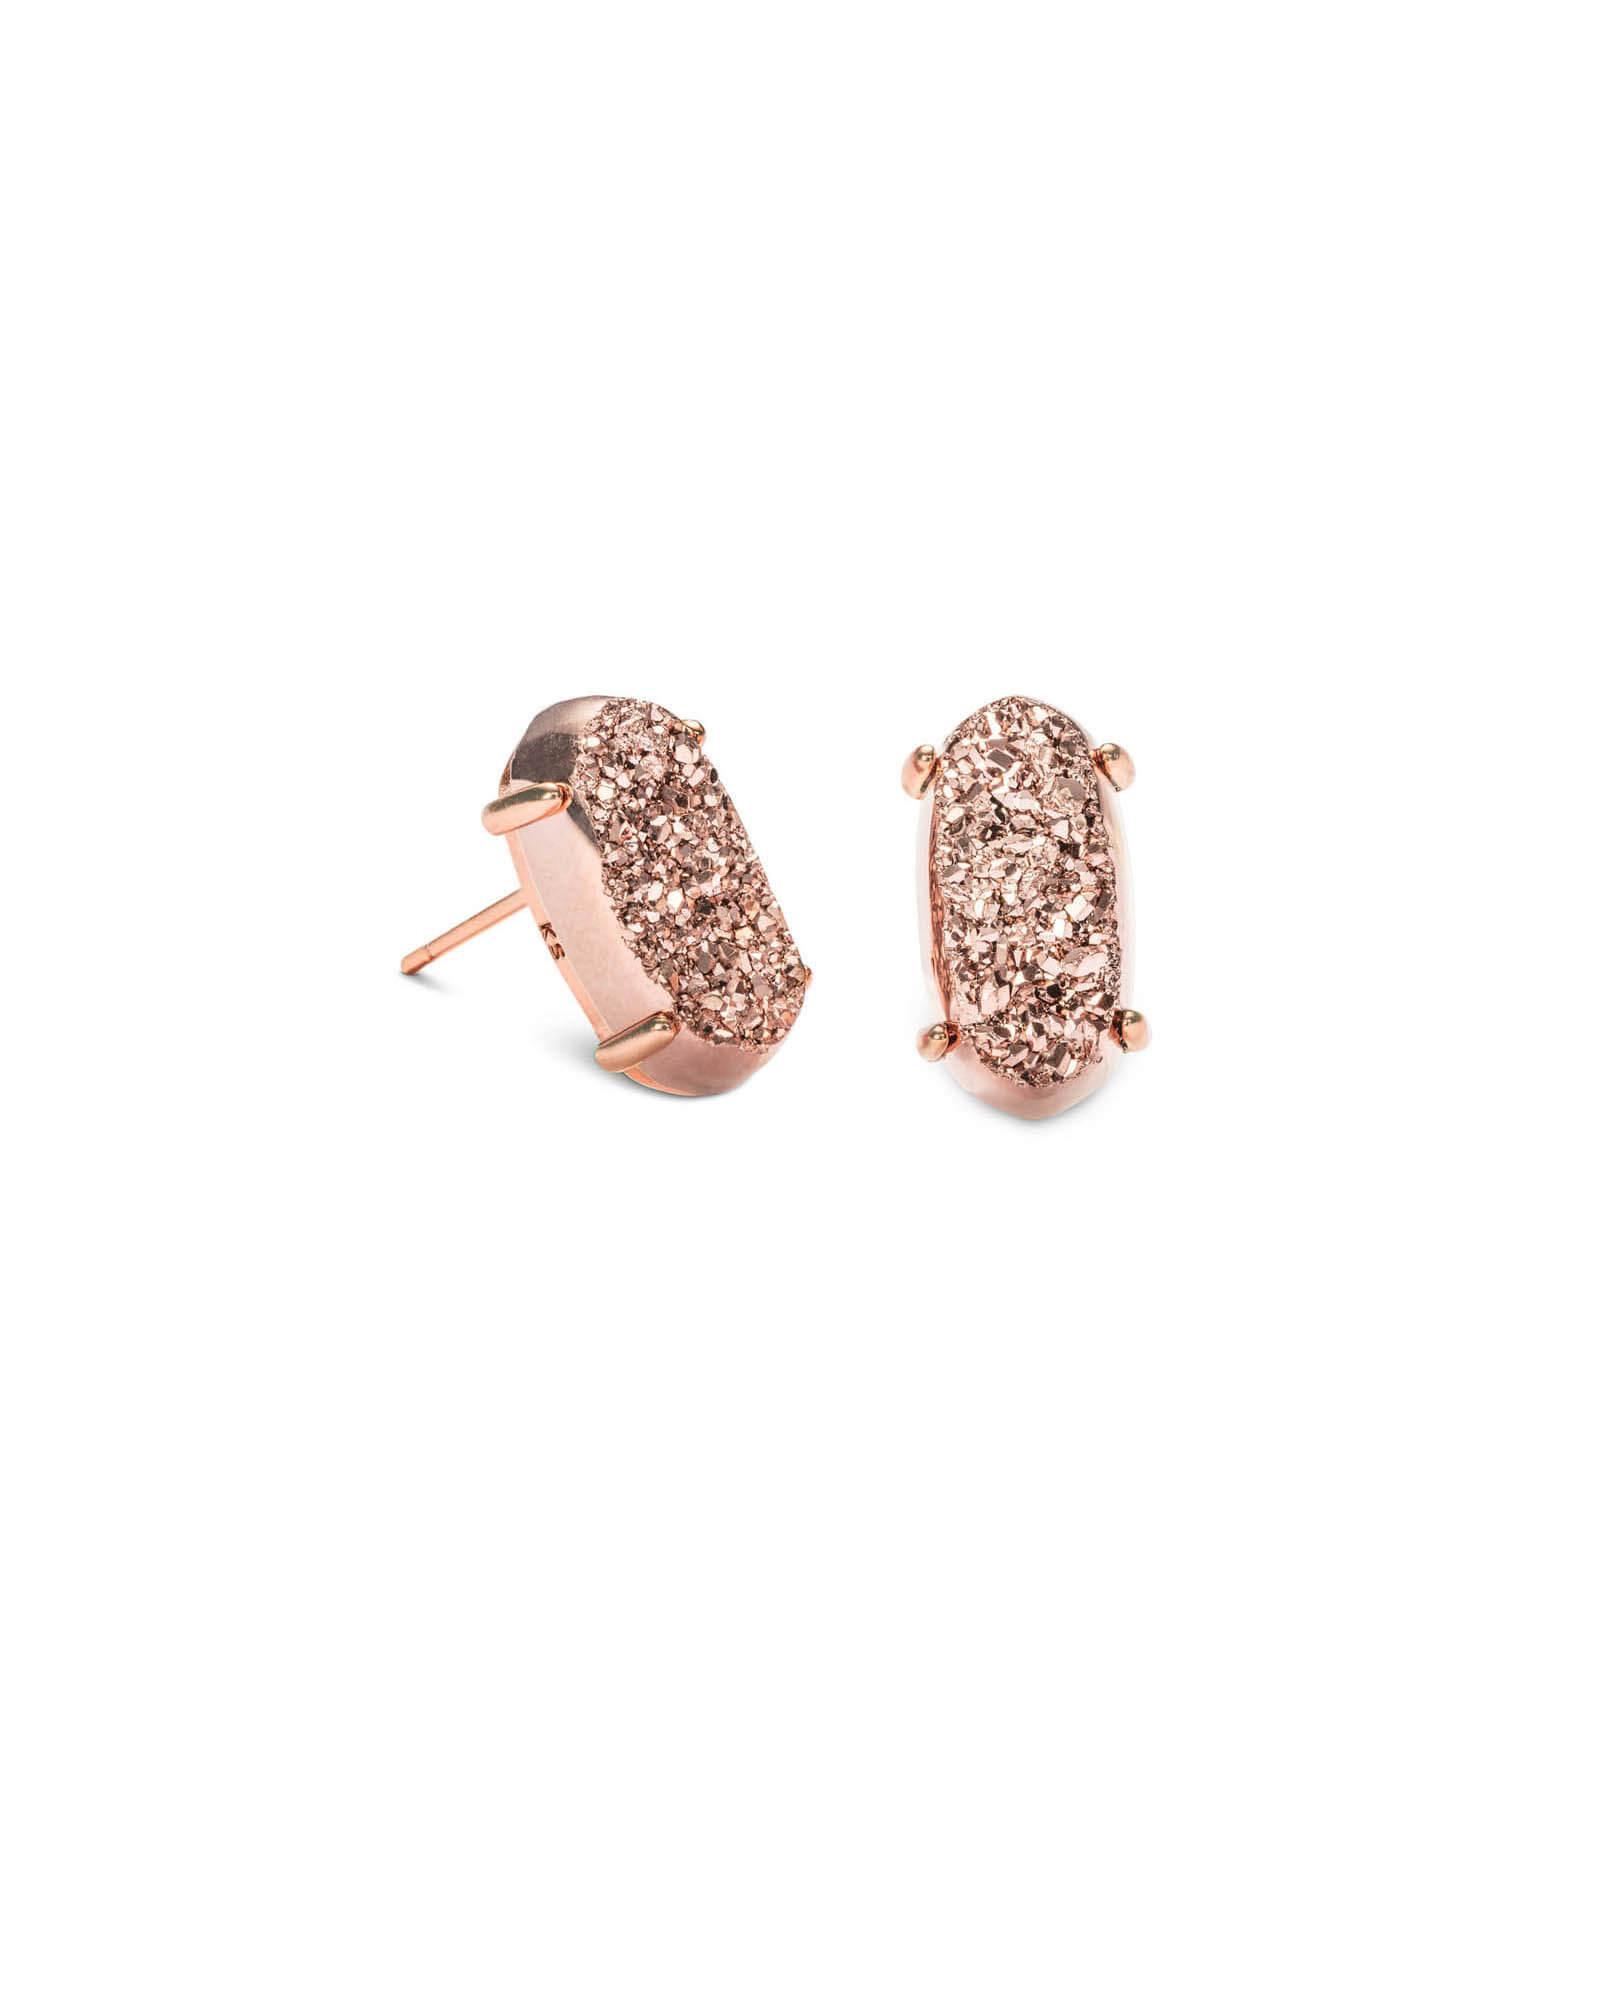 Betty Earring - Rose Gold Drusy